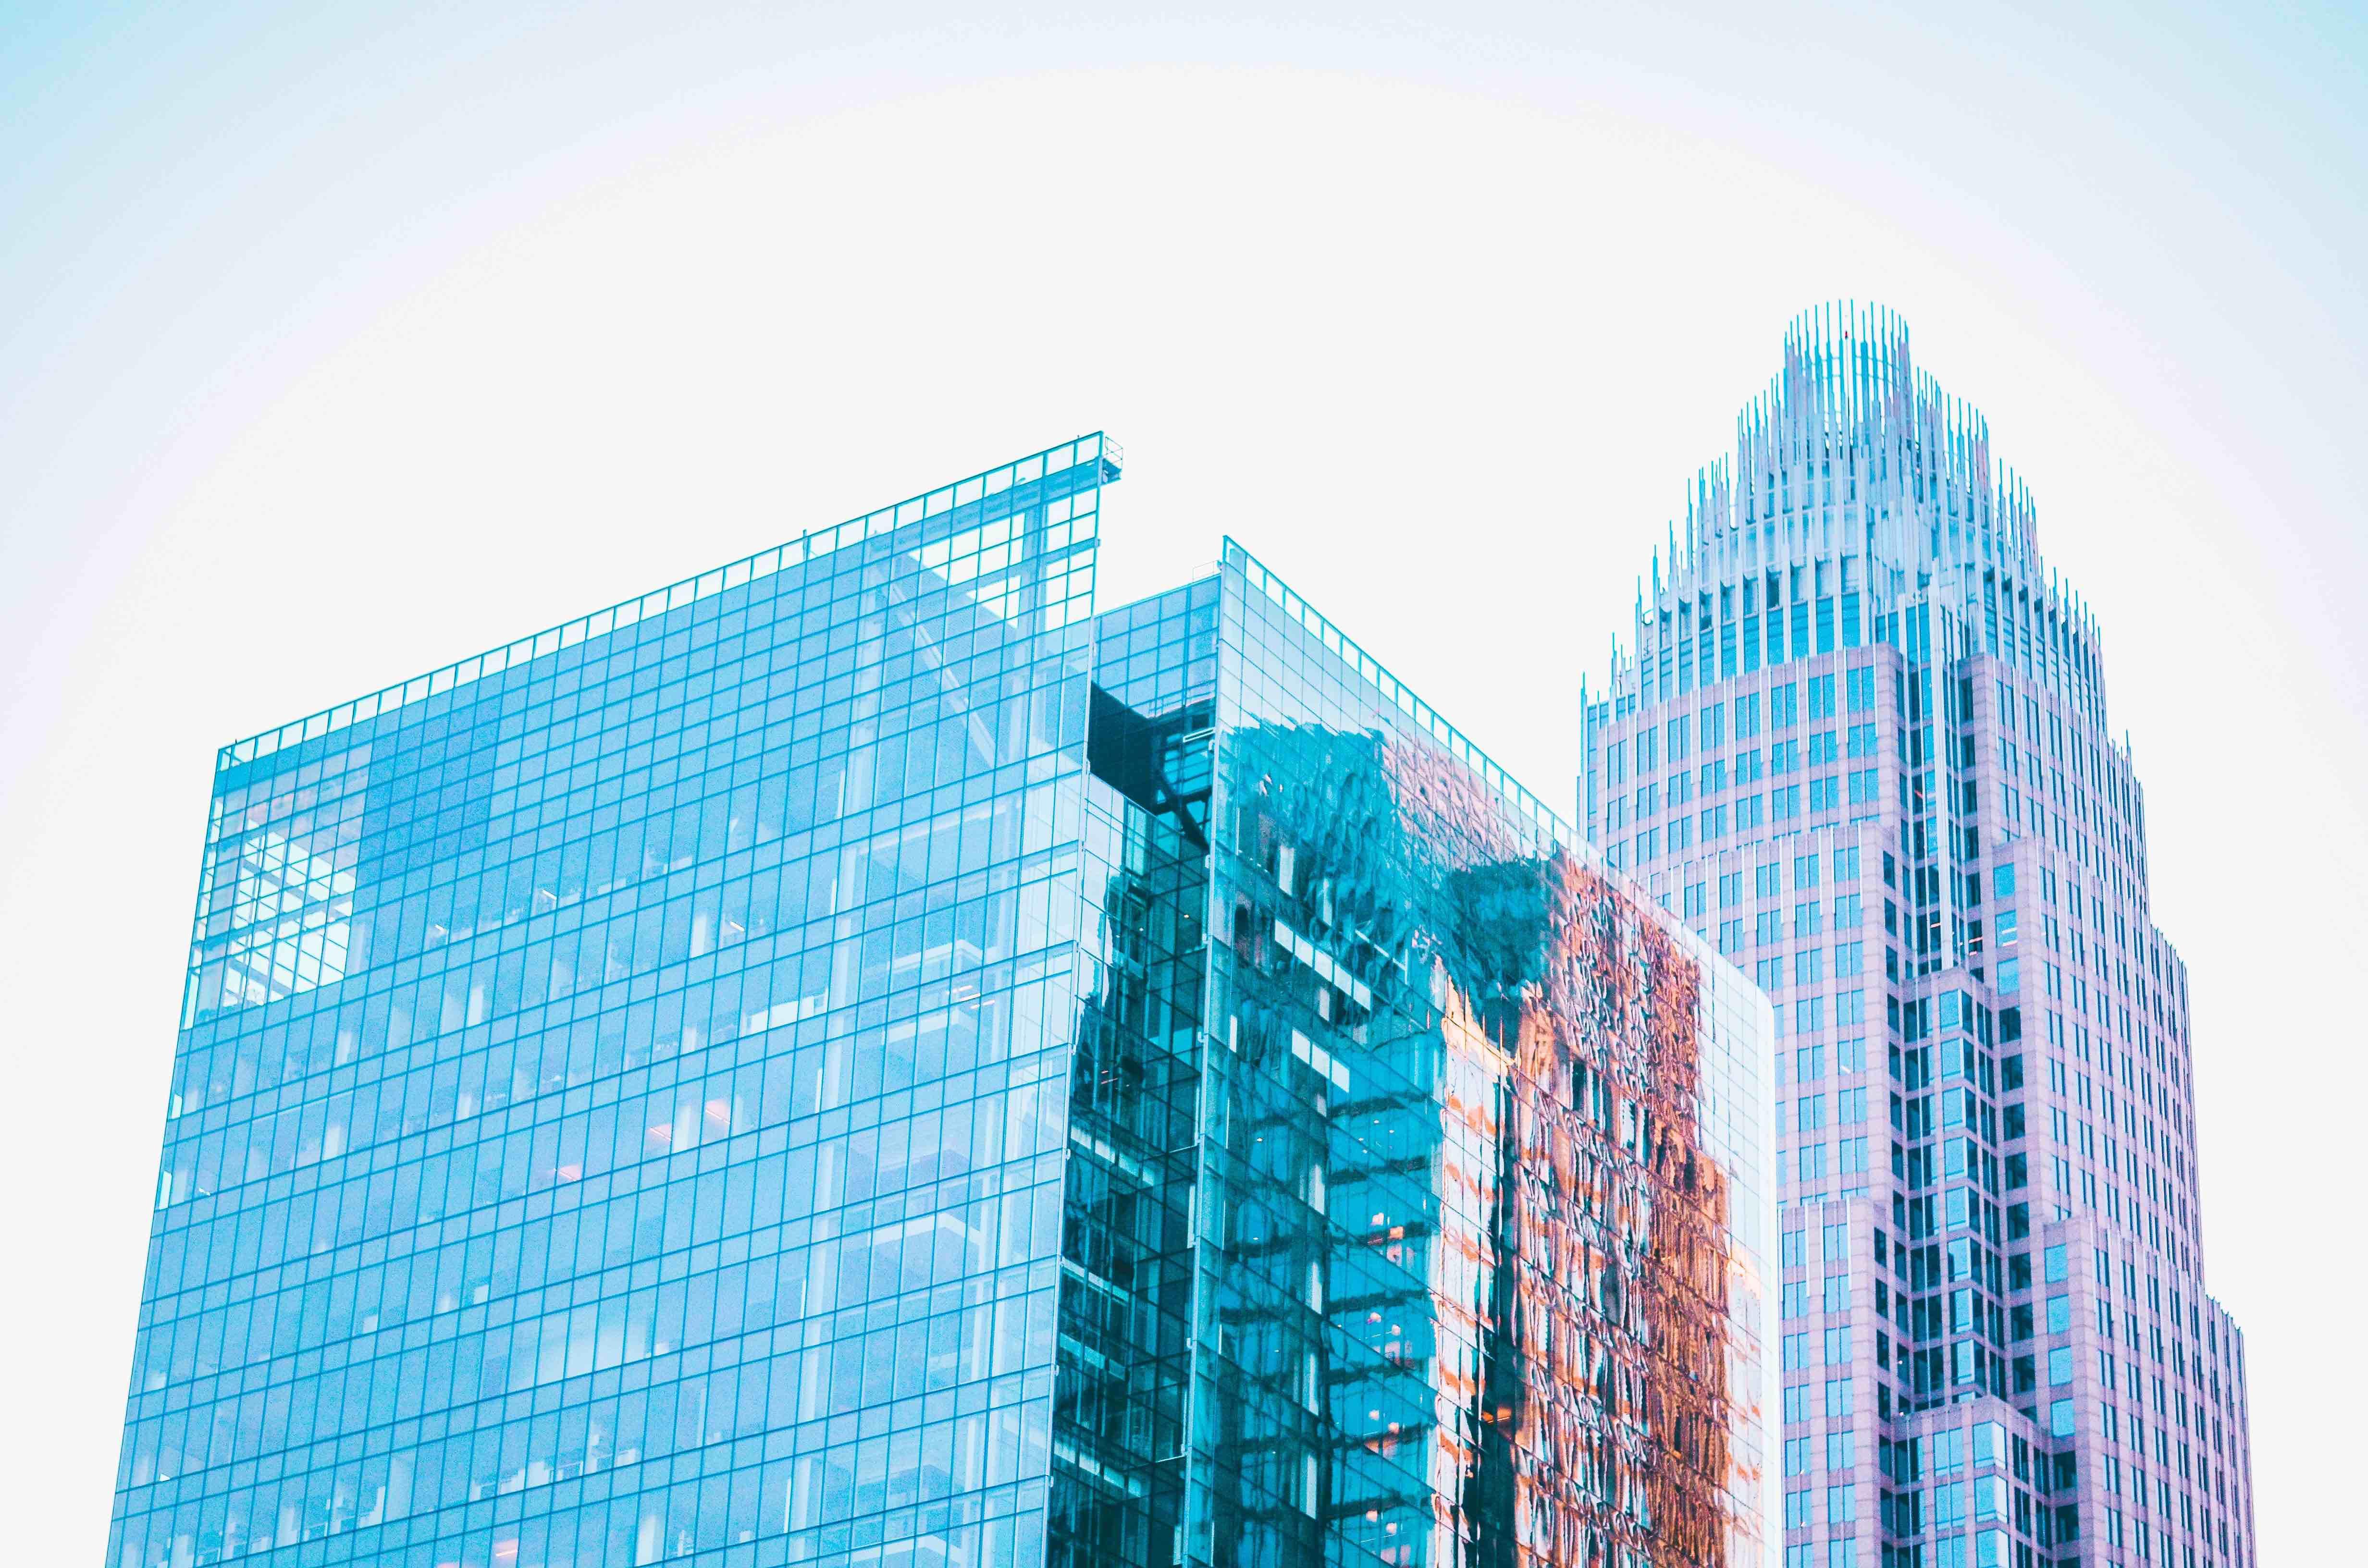 Buildings against a bright blue sky.